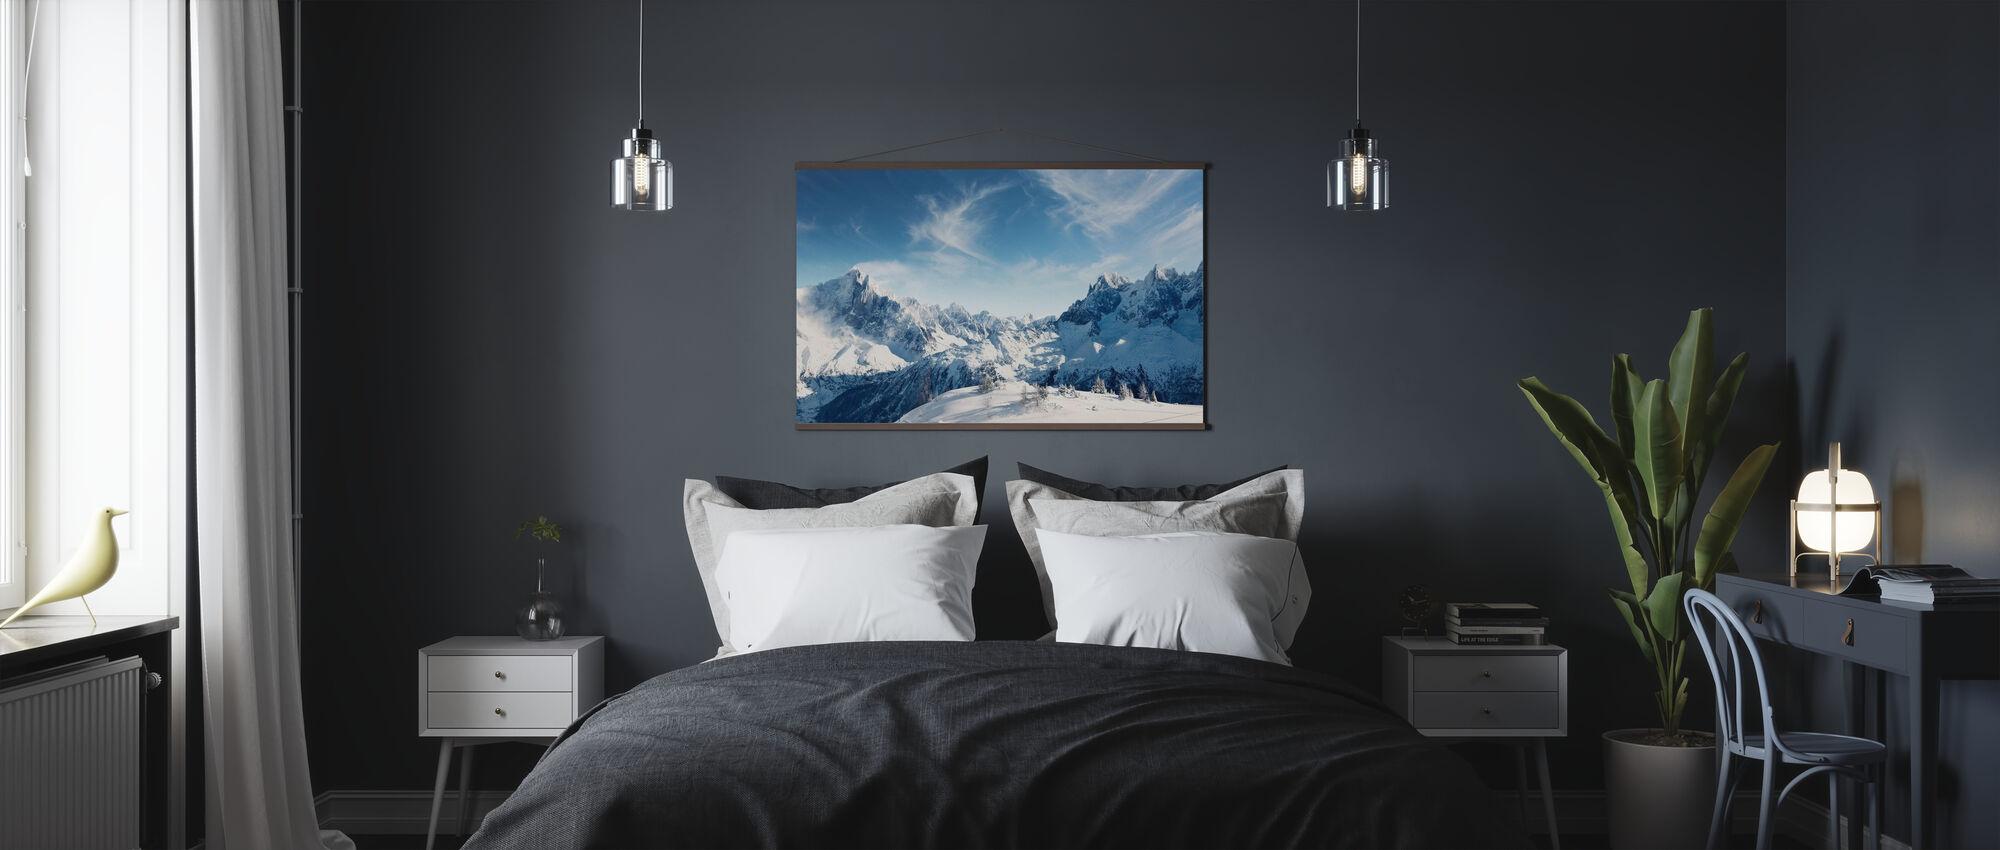 Sunny Alps in Chamonix - Poster - Bedroom